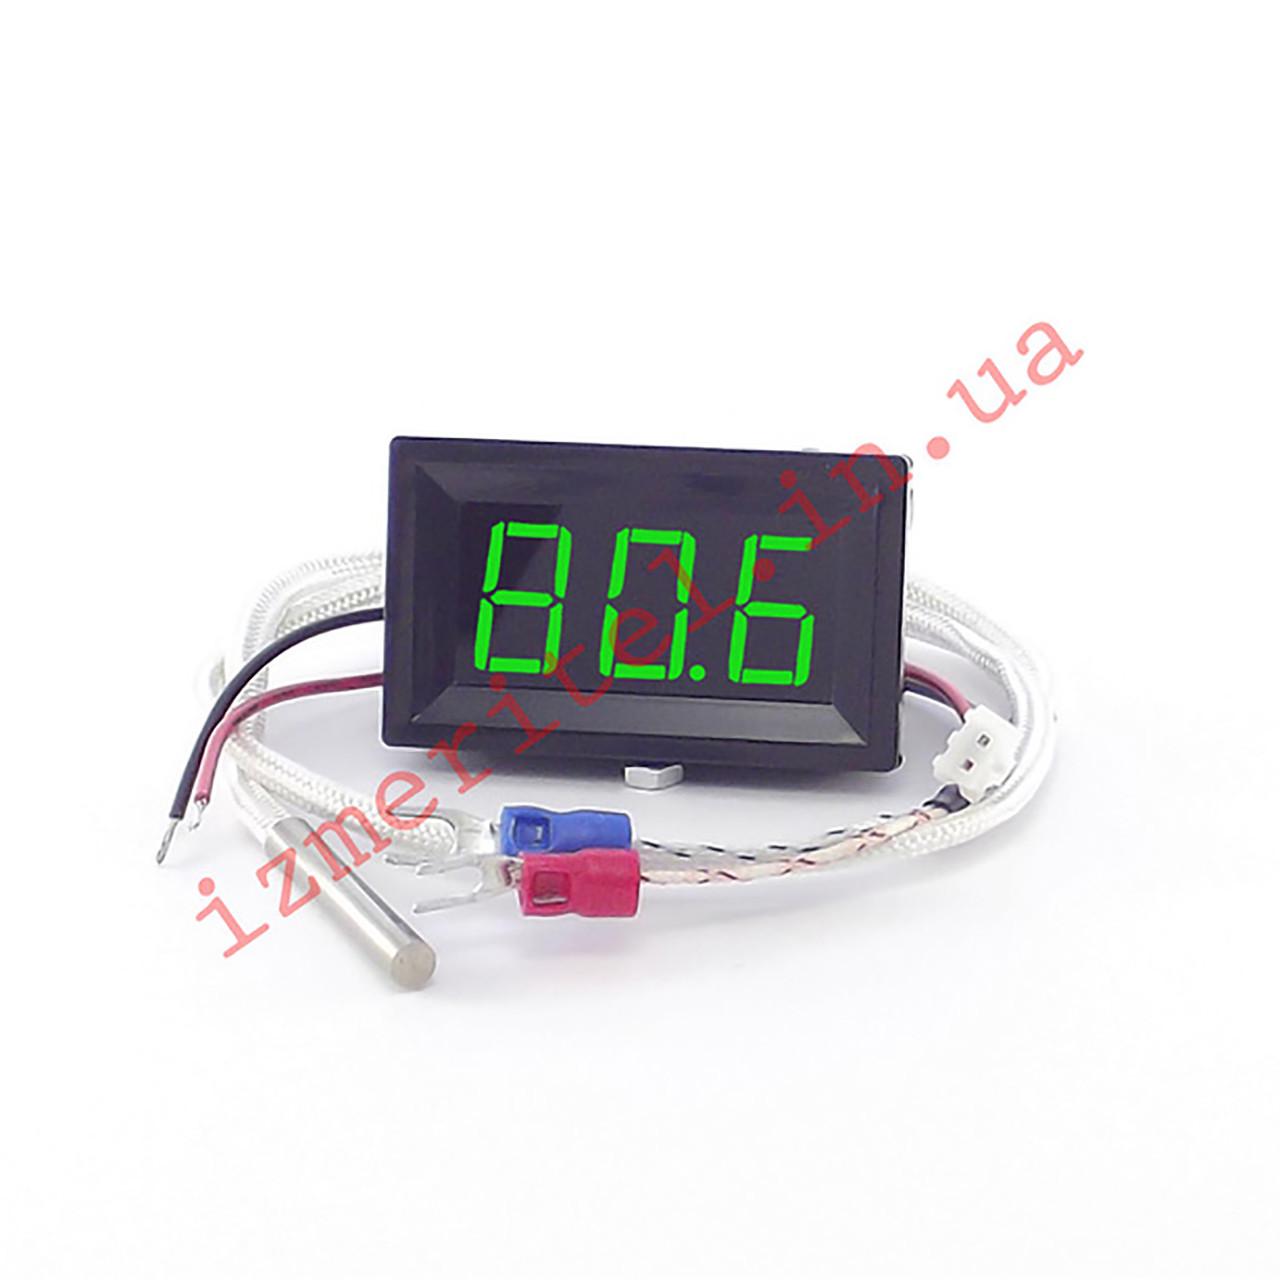 Цифровой термометр -30...+800 °С